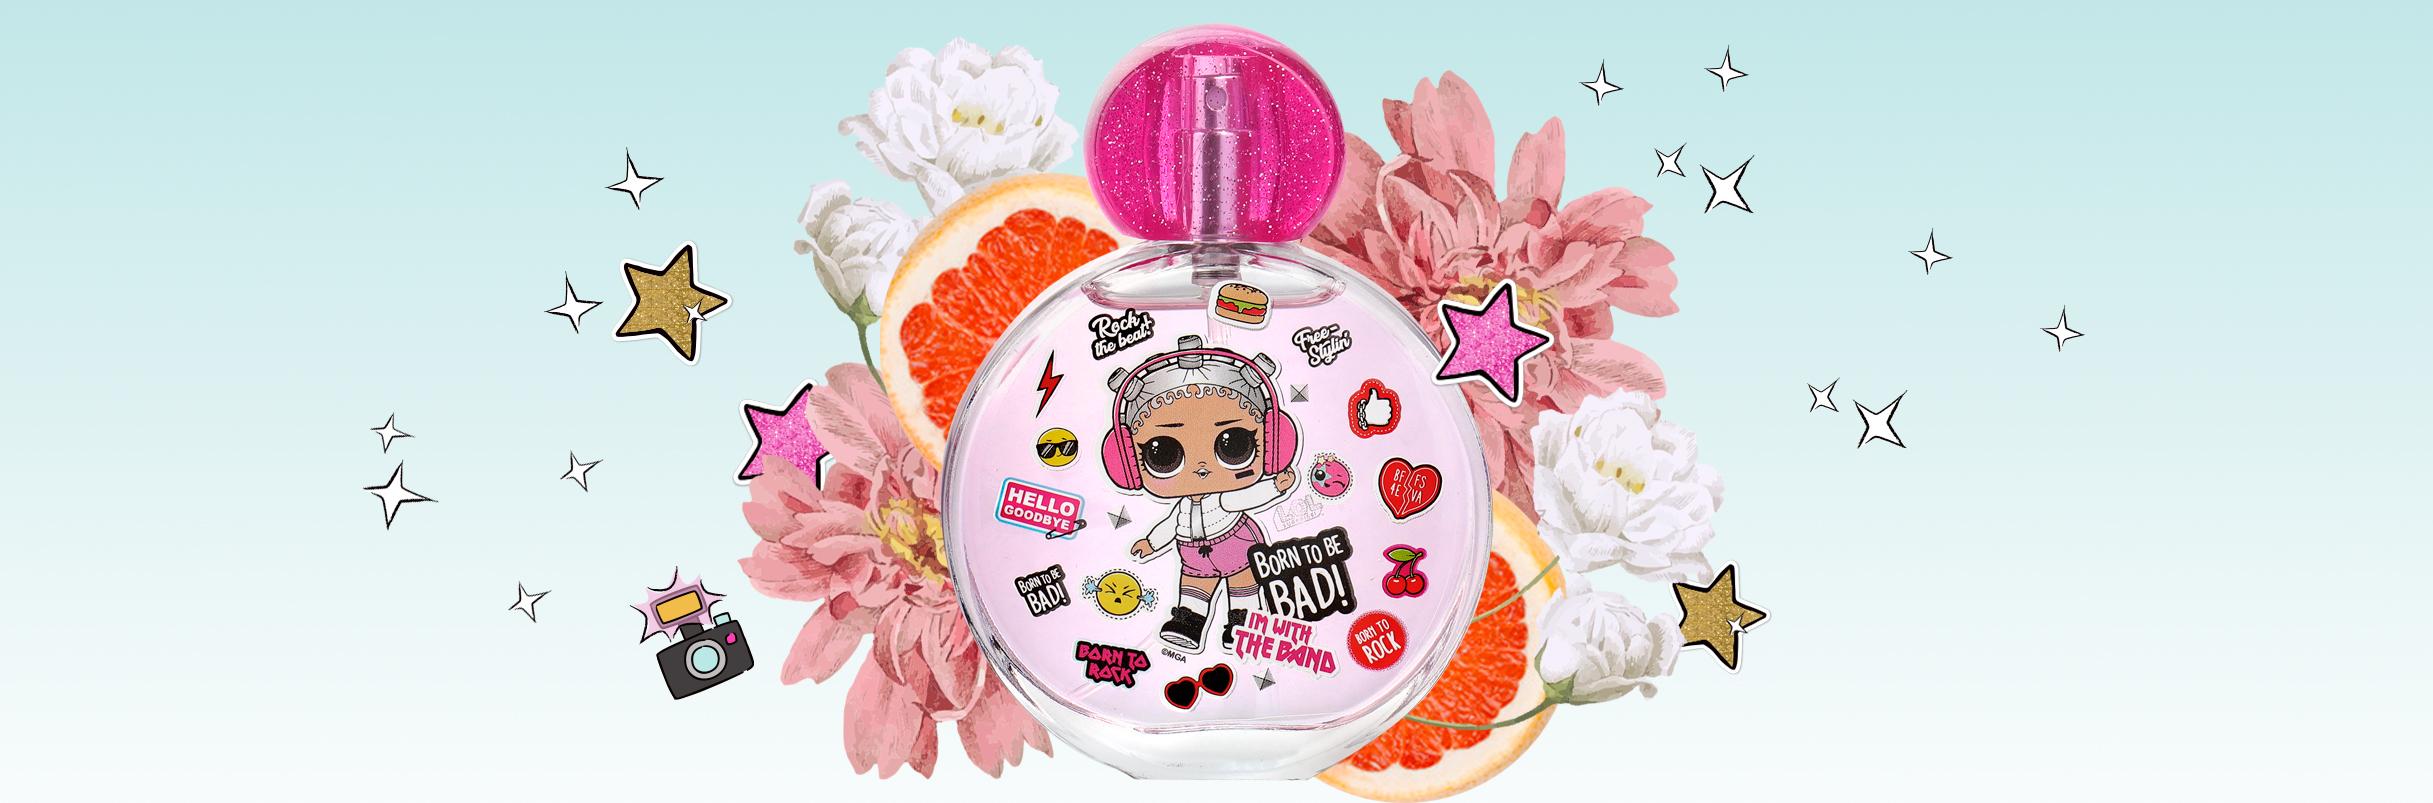 The LOL fragrances